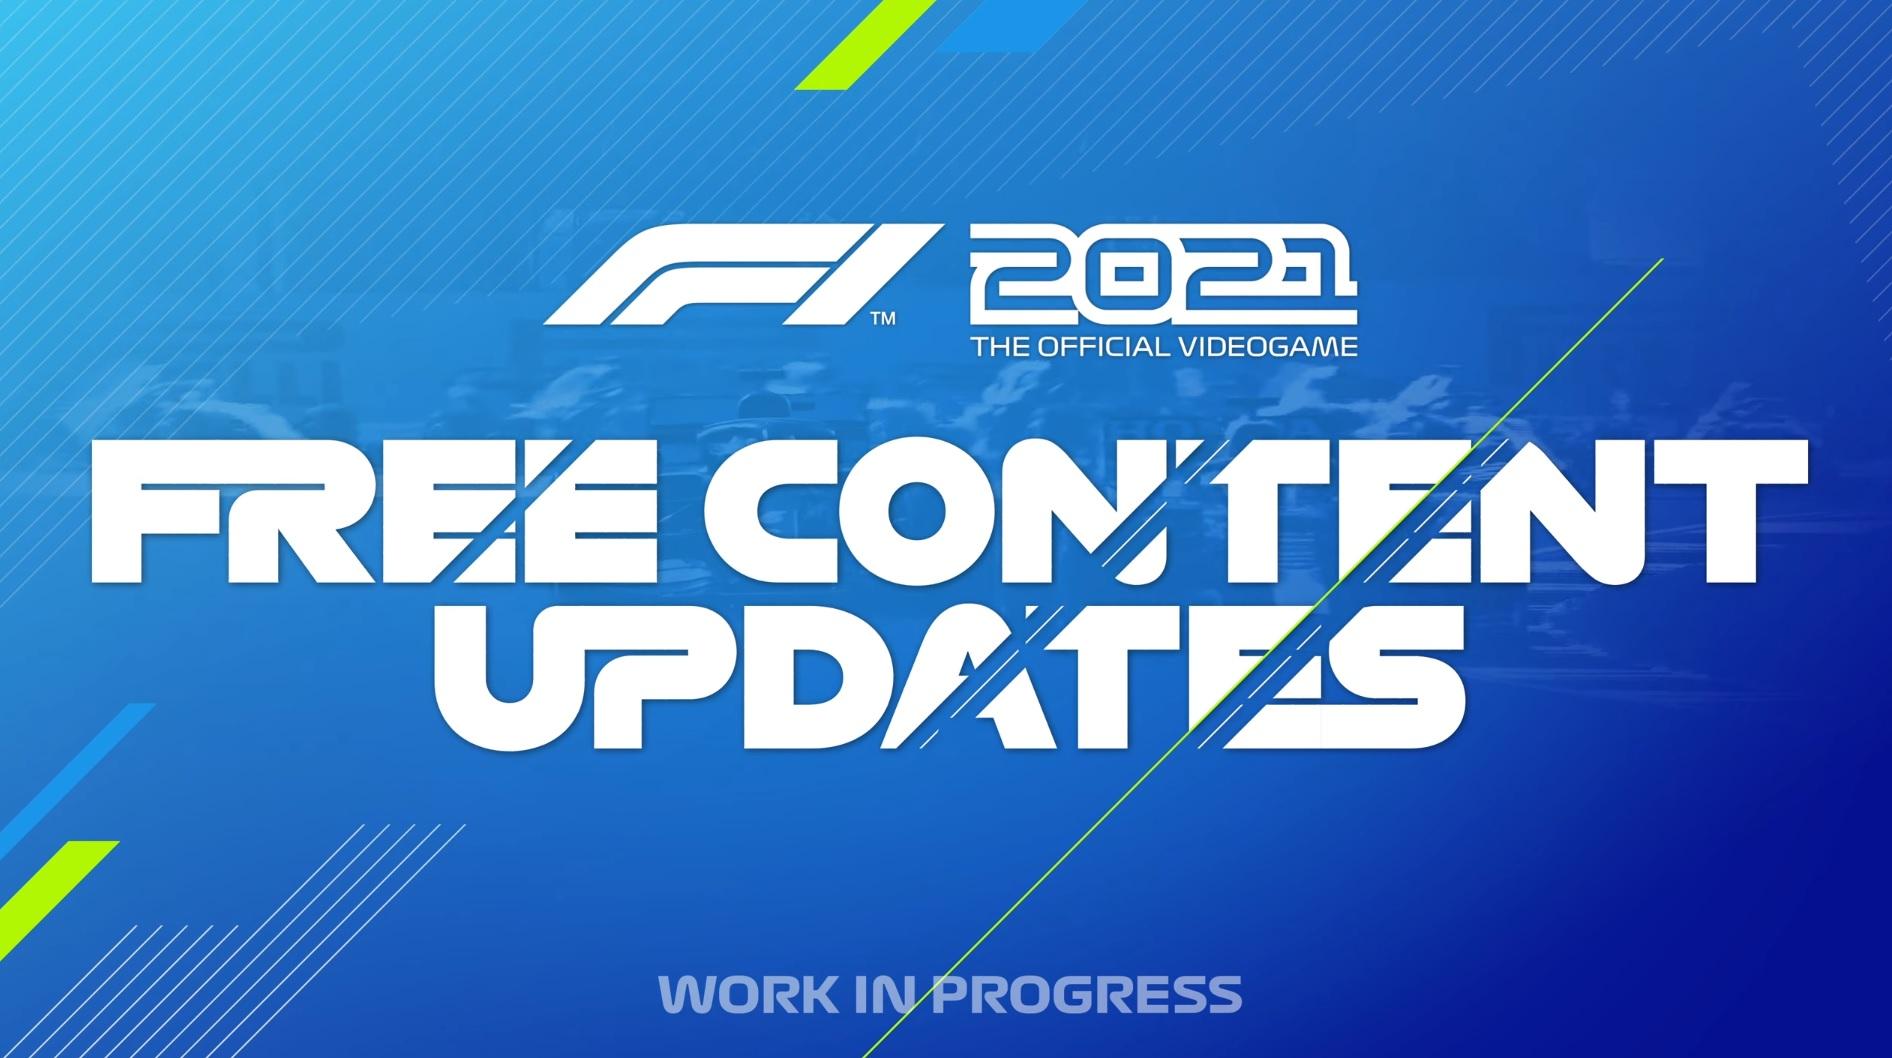 F1 2021 Free Content Updates Trailer